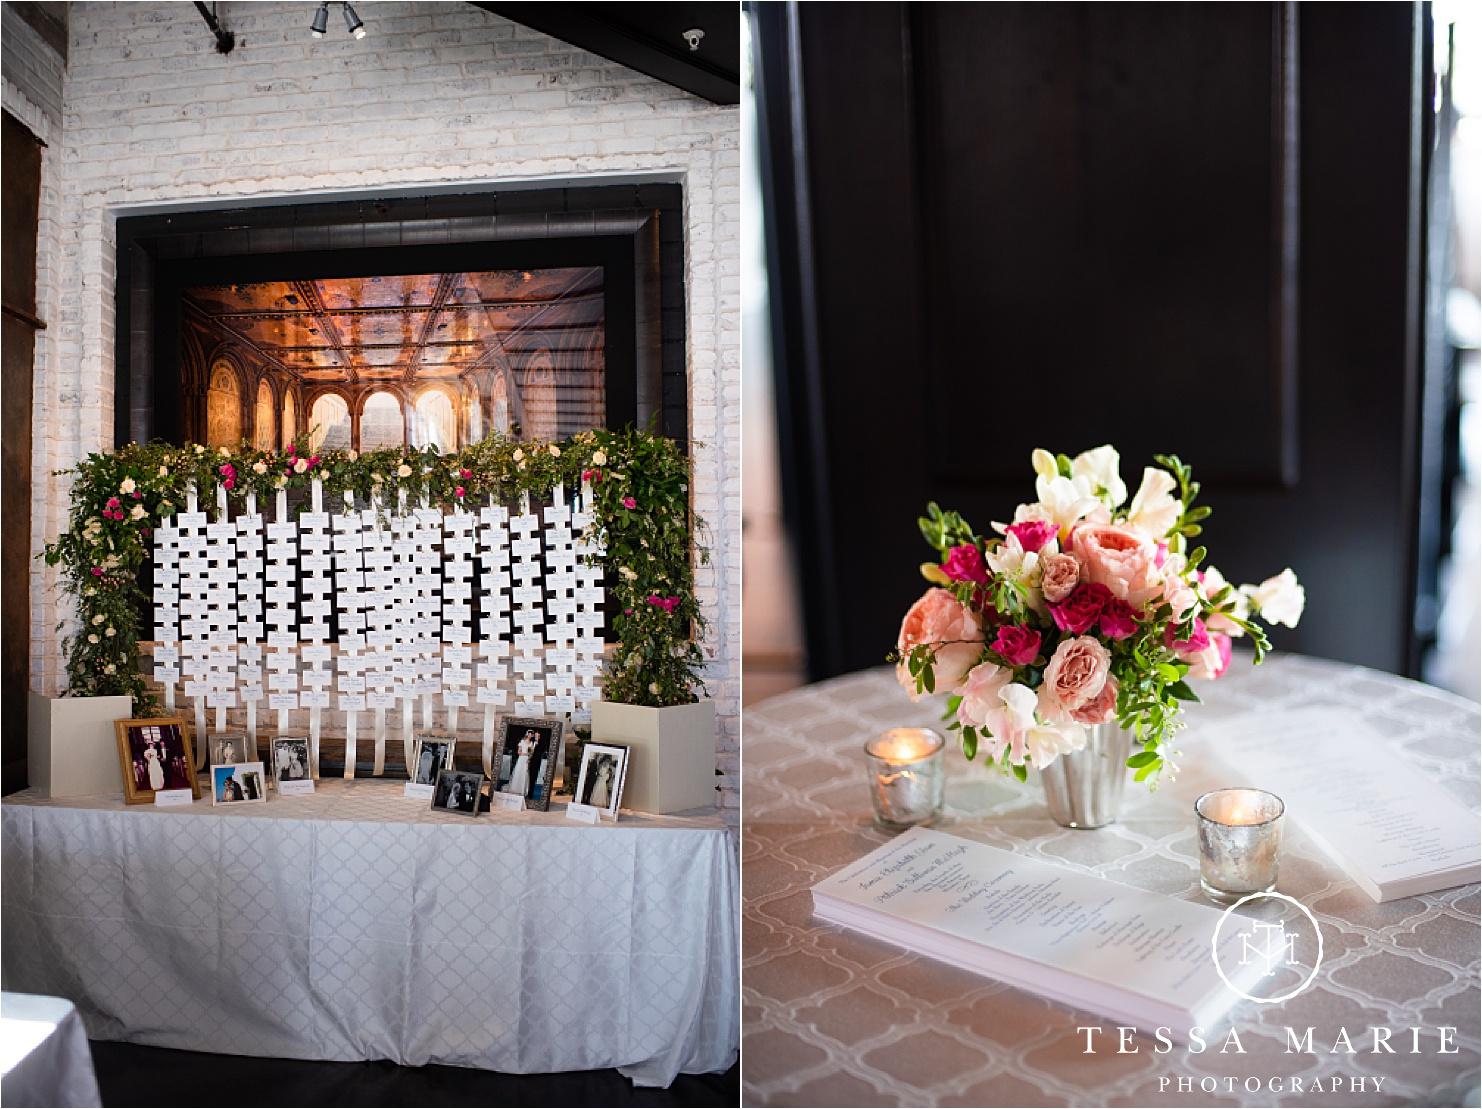 Tessa_marie_weddings_houston_wedding_photographer_The_astorian_0129.jpg